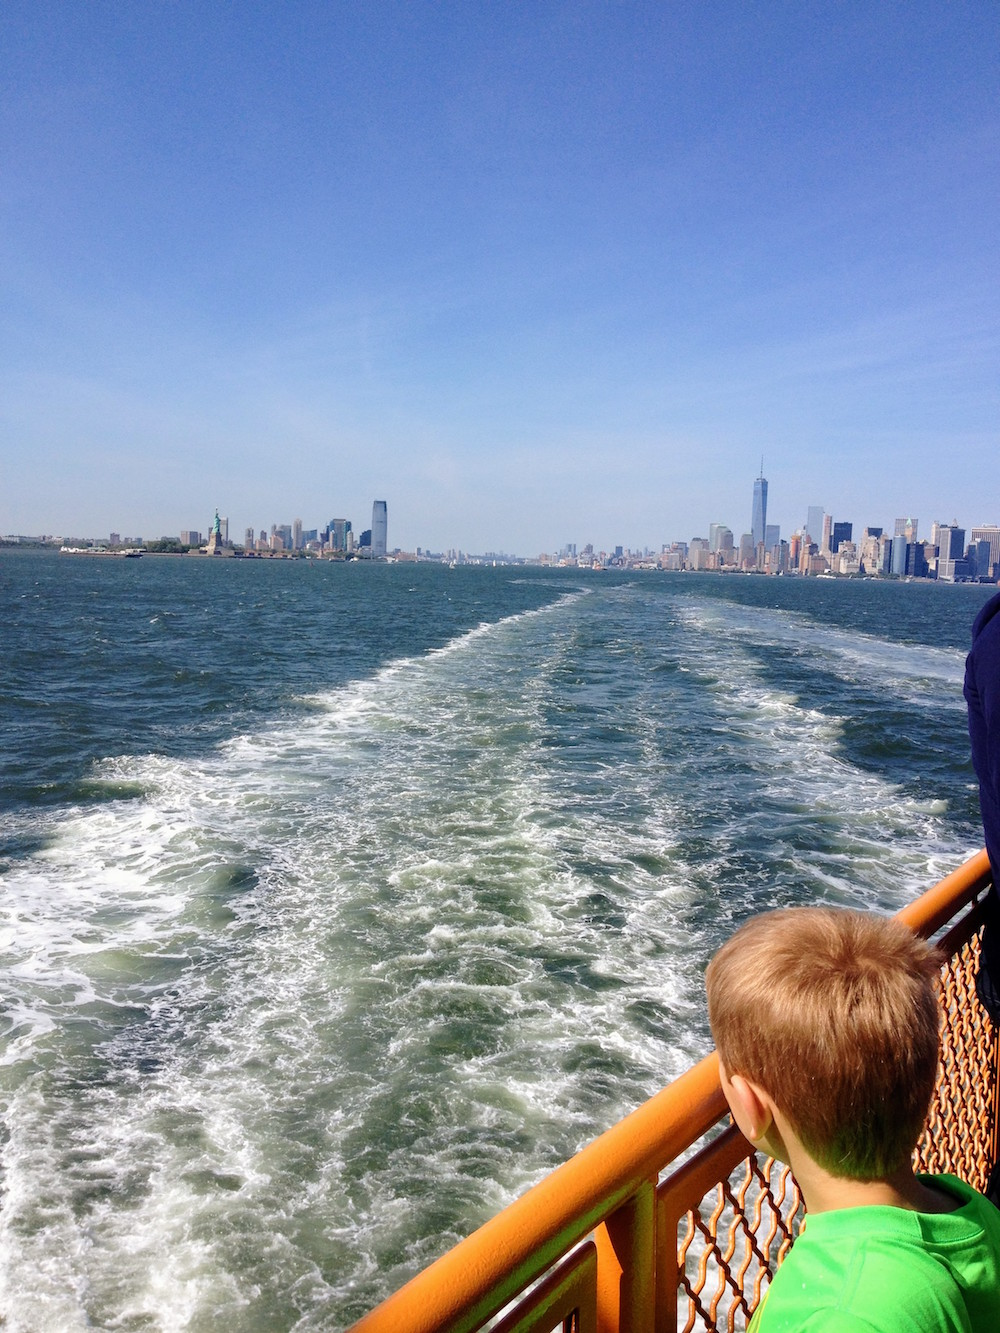 Statue of Liberty, Staten Island Ferry, New York City.jpg